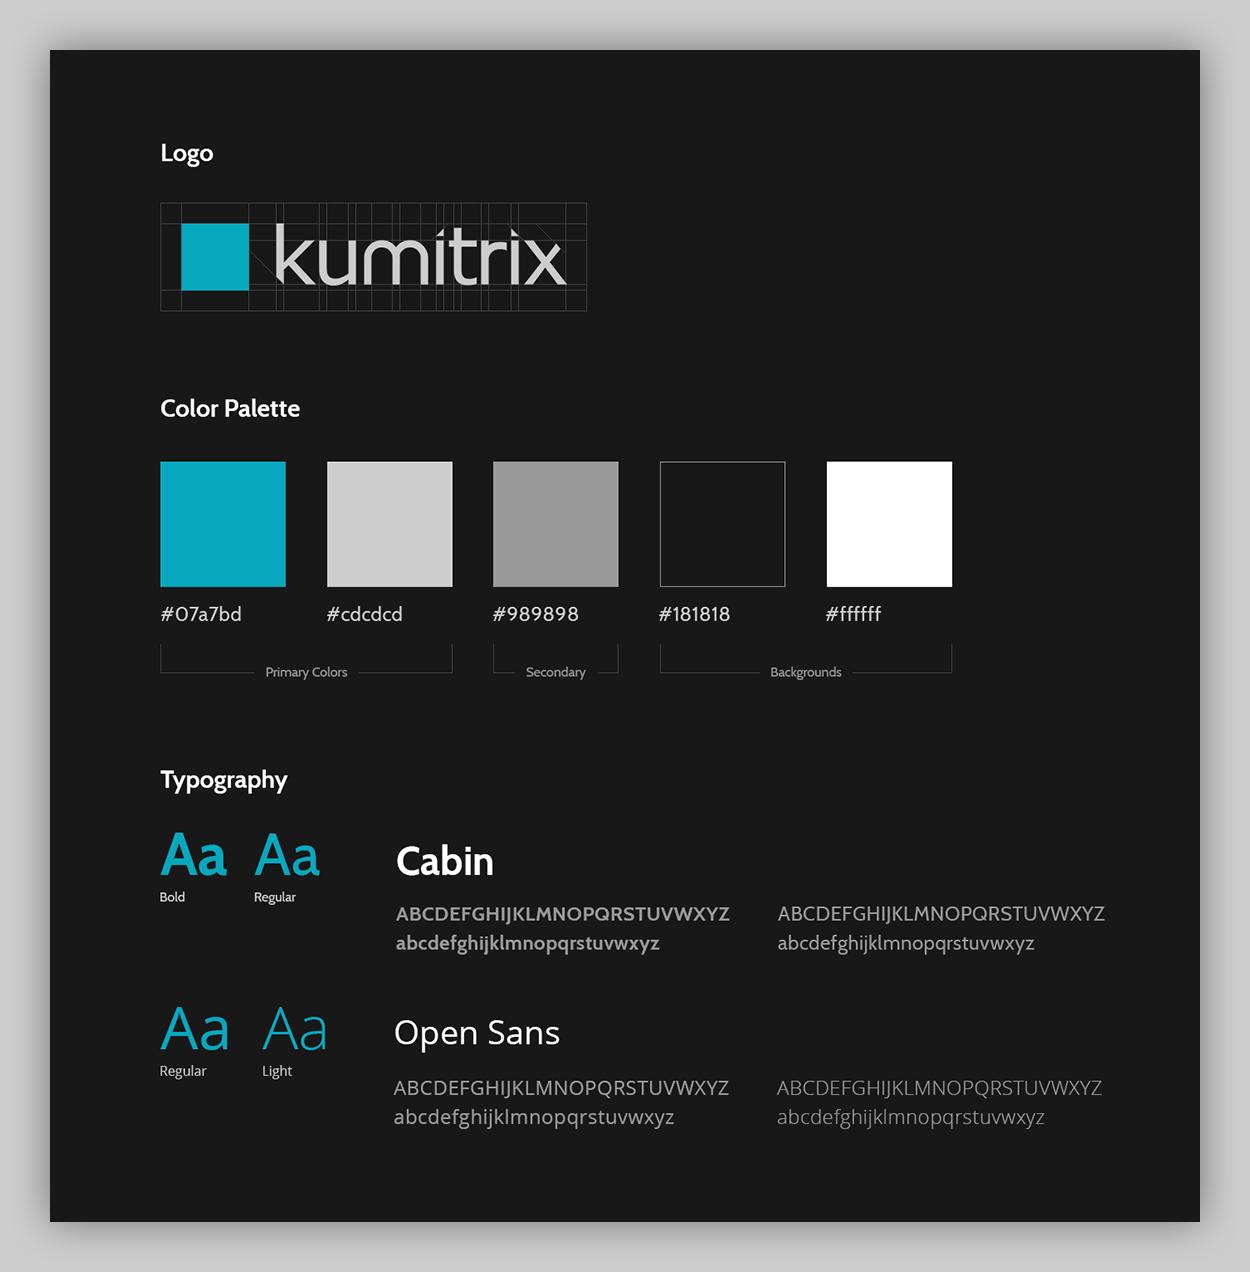 kumitrix brand guidelines